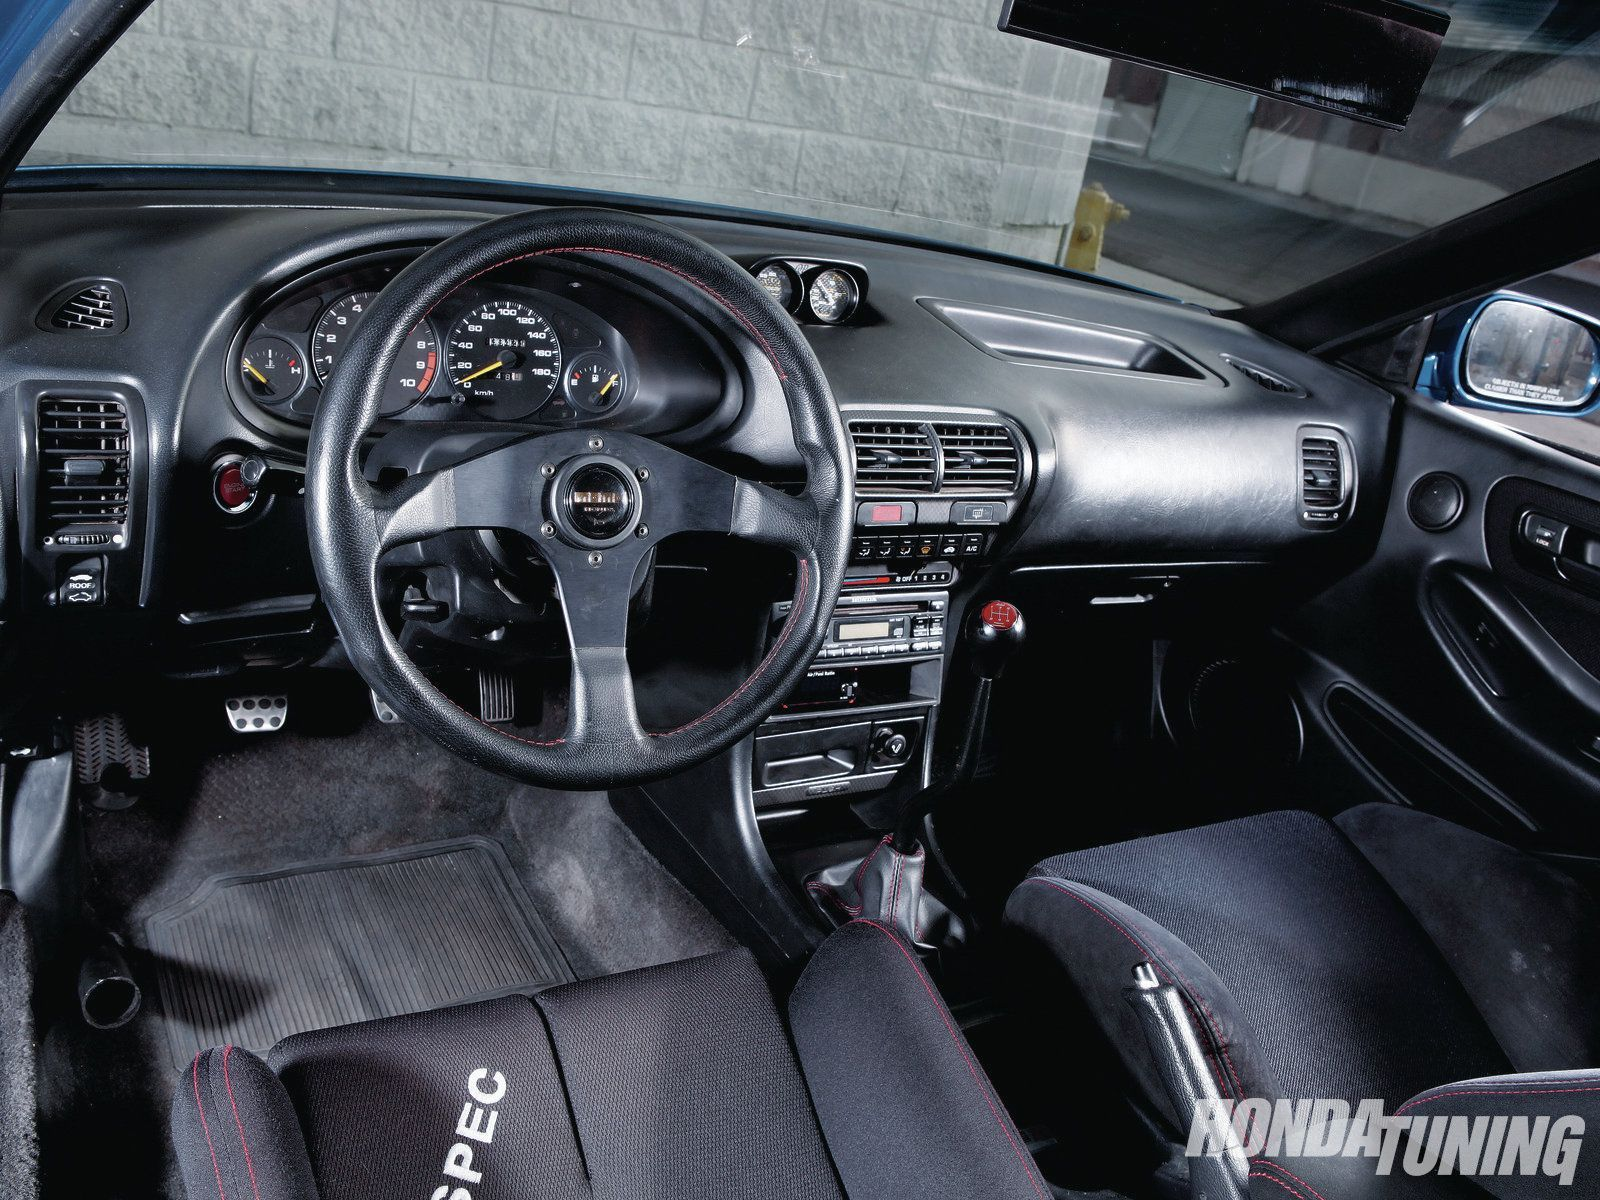 Htup 1203 07 1996 acura integra gs r interior Honda